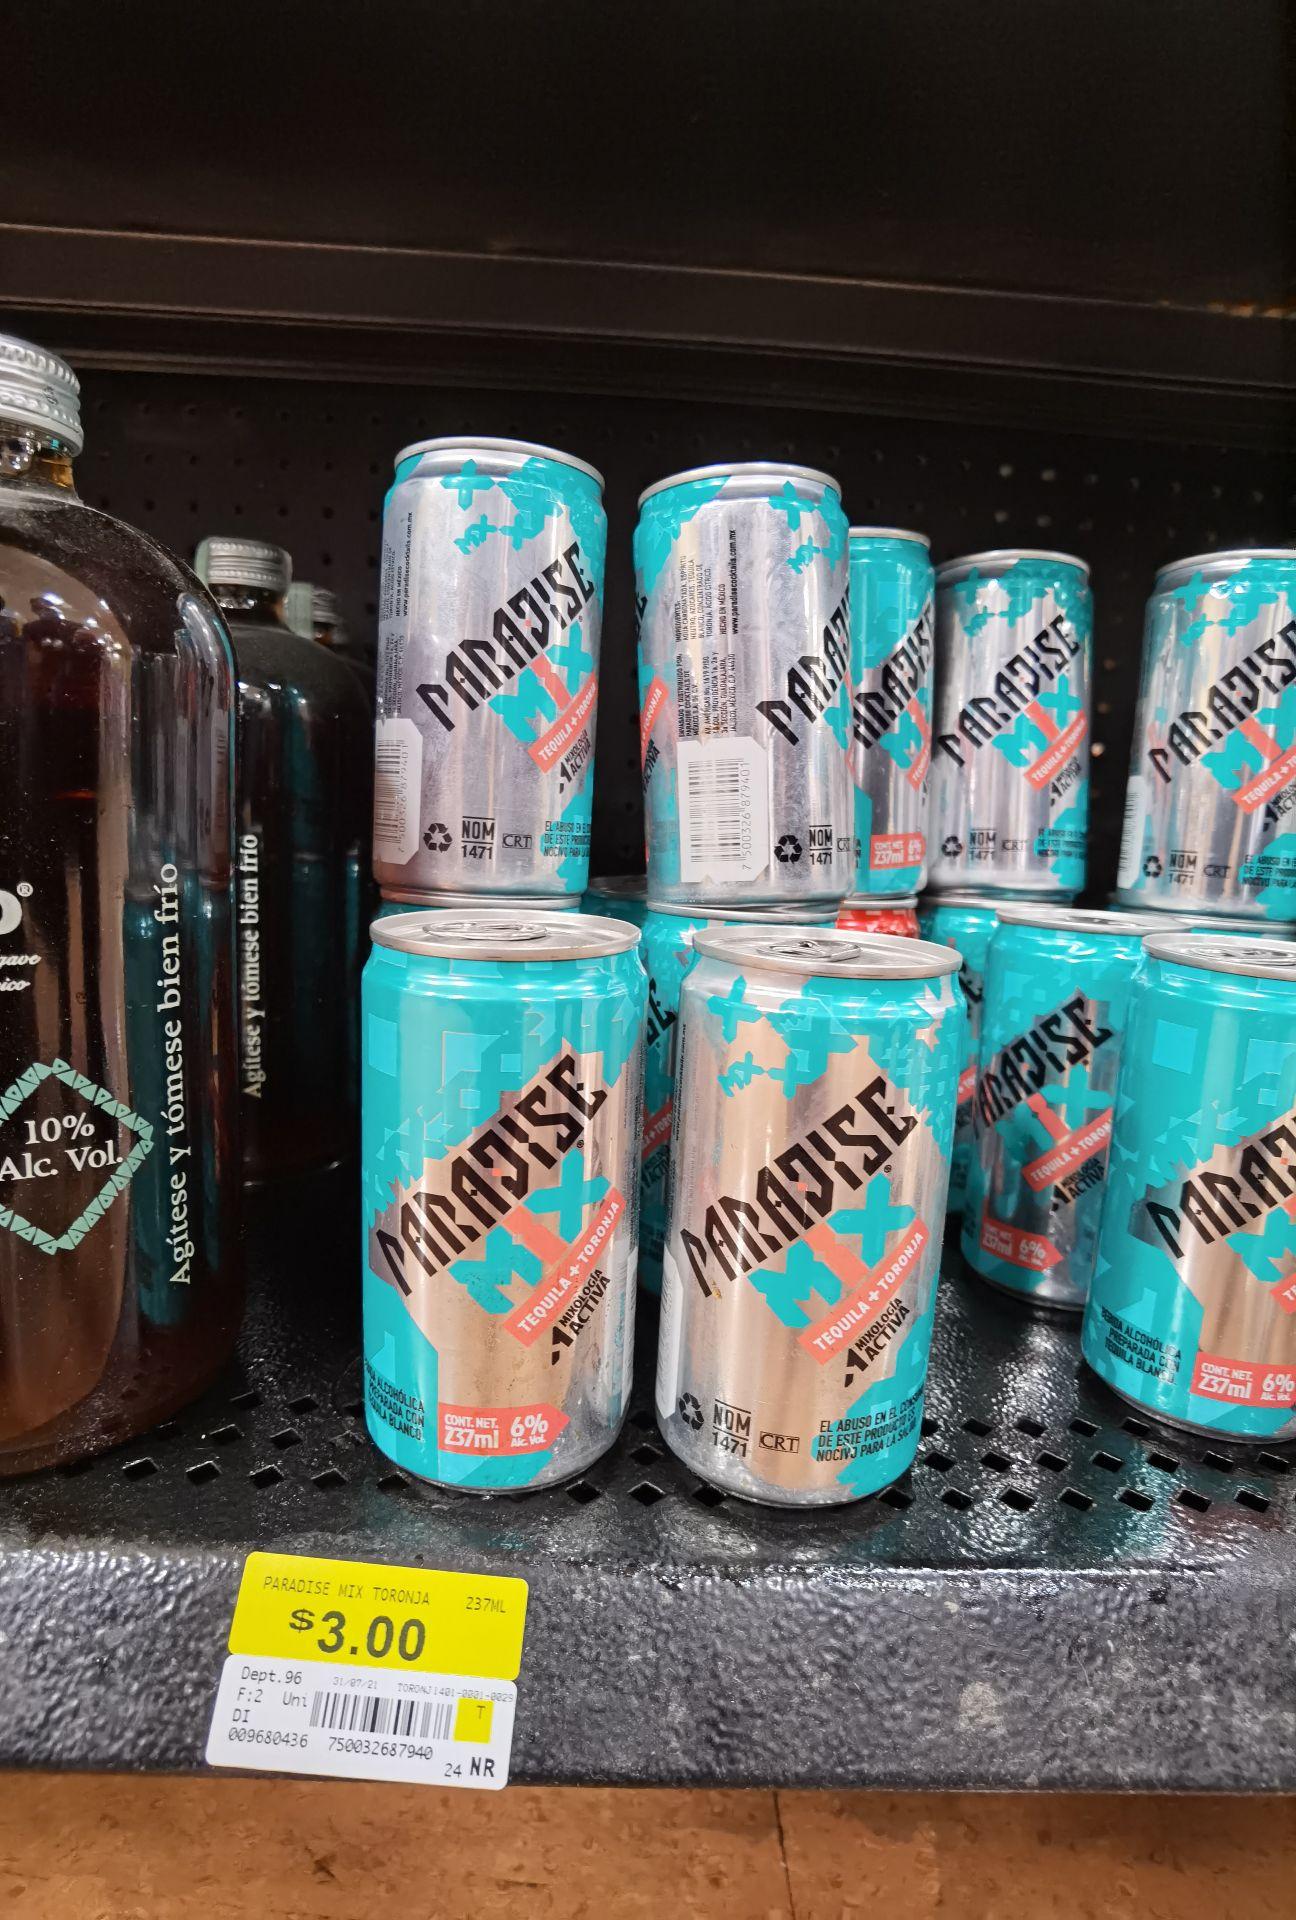 Walmart: Paradise Mix (Tequila con toronja)